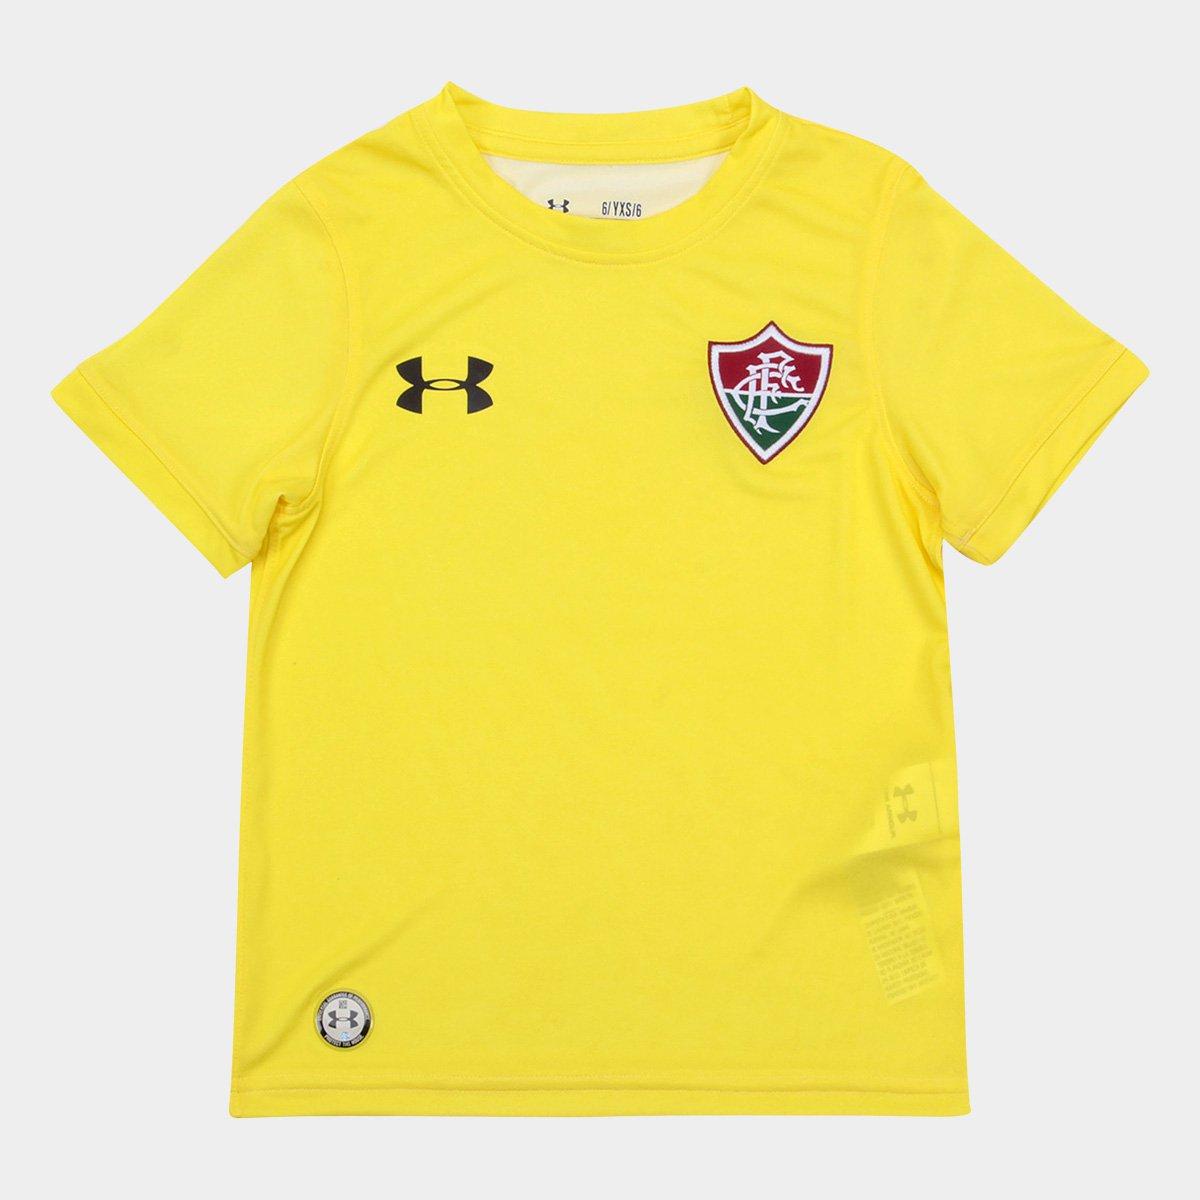 ddb7f2e3ed Camisa Fluminense I Infantil 17 18 s nº Torcedor Under Armour